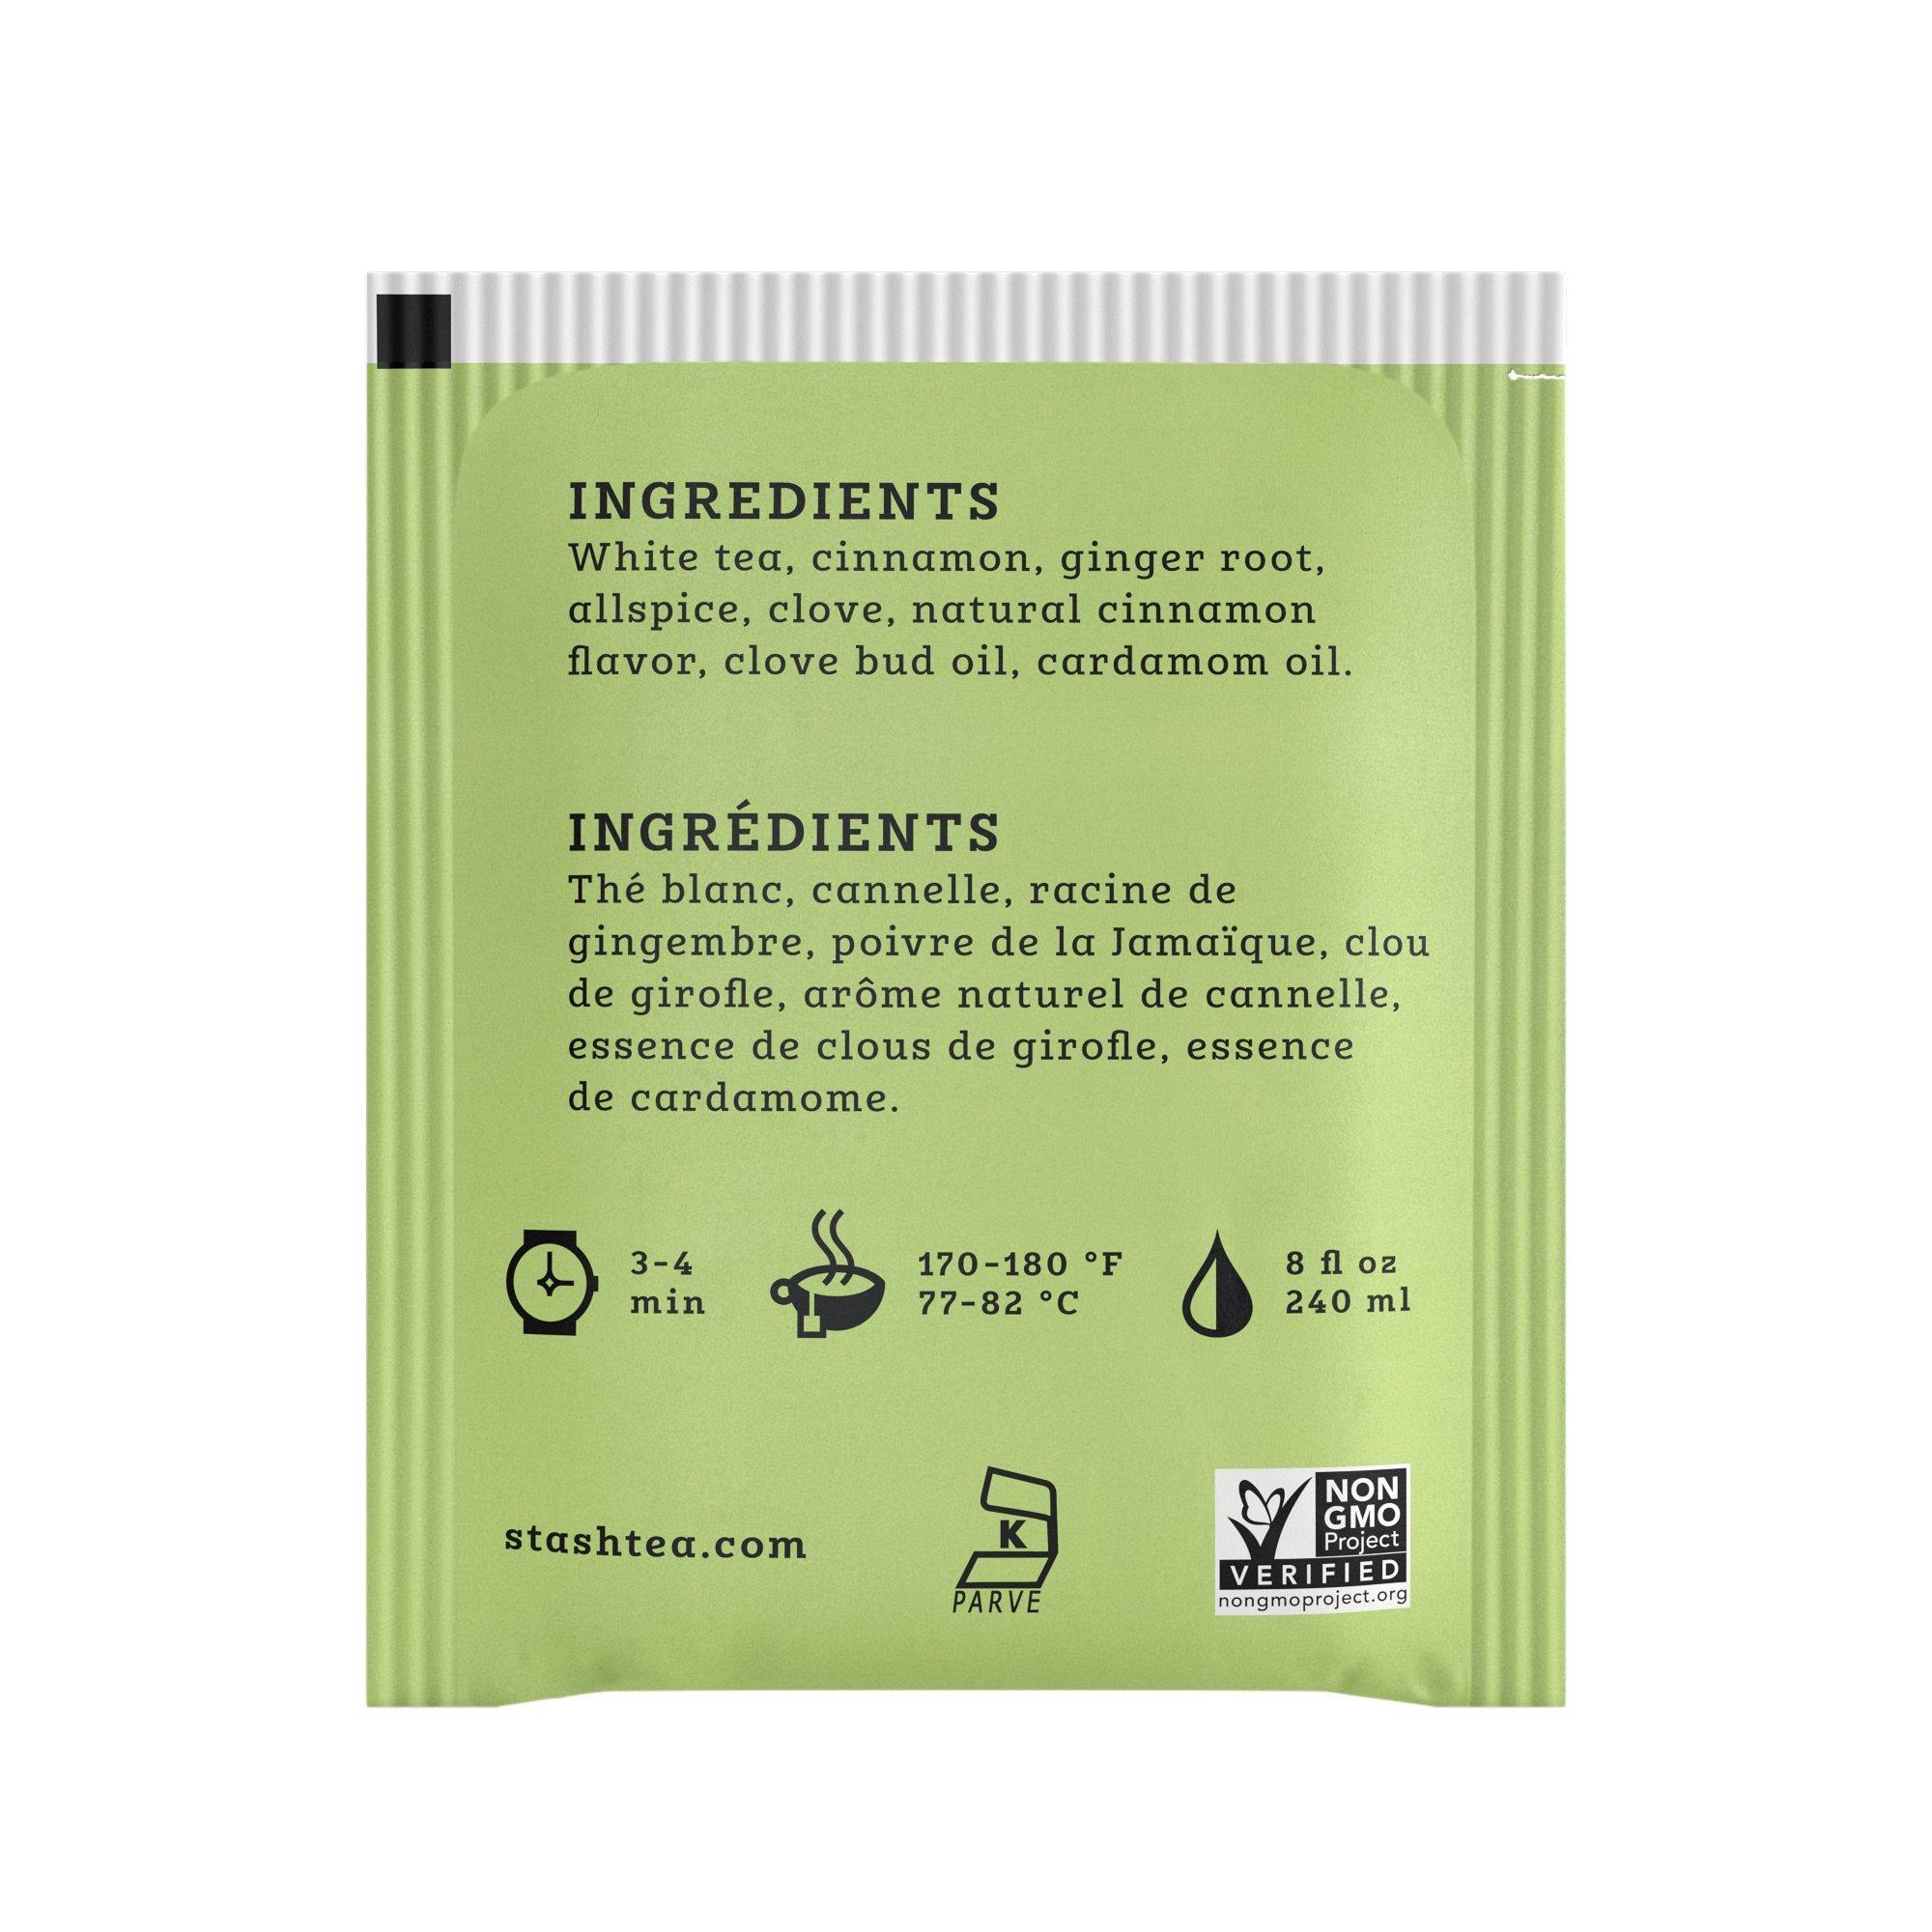 Stash Tea White Chai Tea 1000 Count Tea Bags in Foil Individual Spiced White Tea Bags for Use in Teapots Mugs or Cups, Brew Hot Tea or Iced Tea by Stash Tea (Image #4)